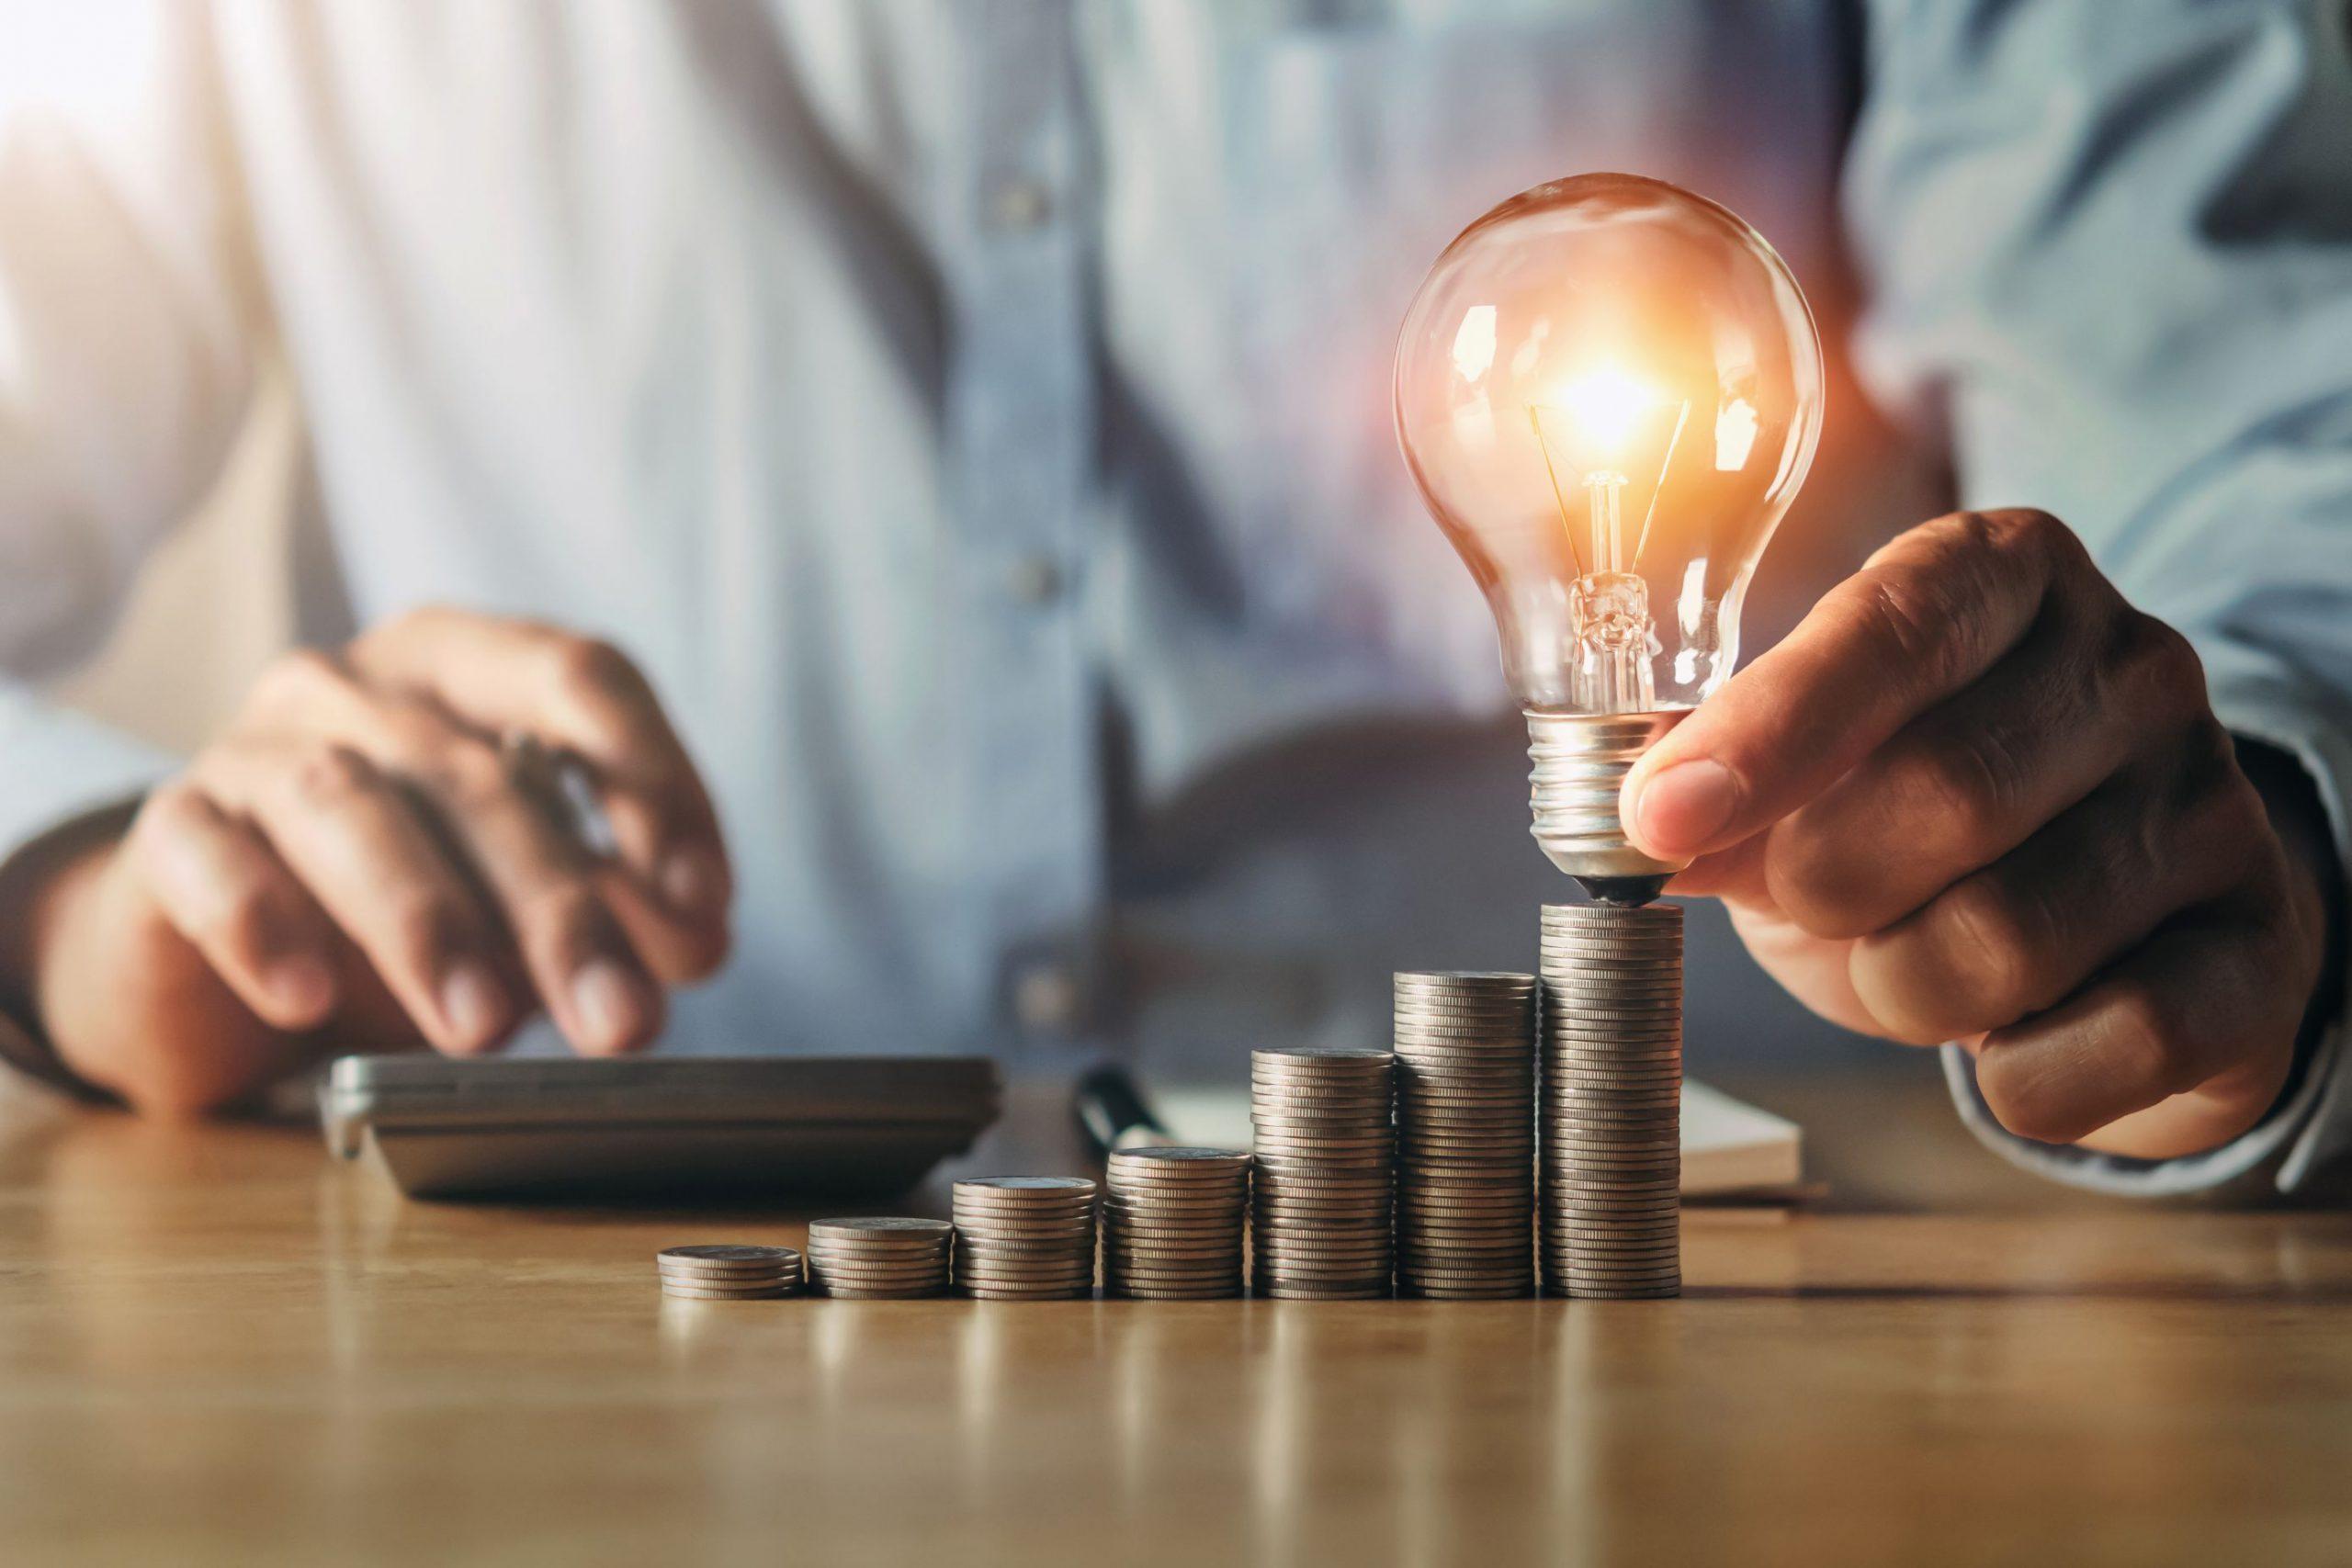 25 Proven Ways To Save Money